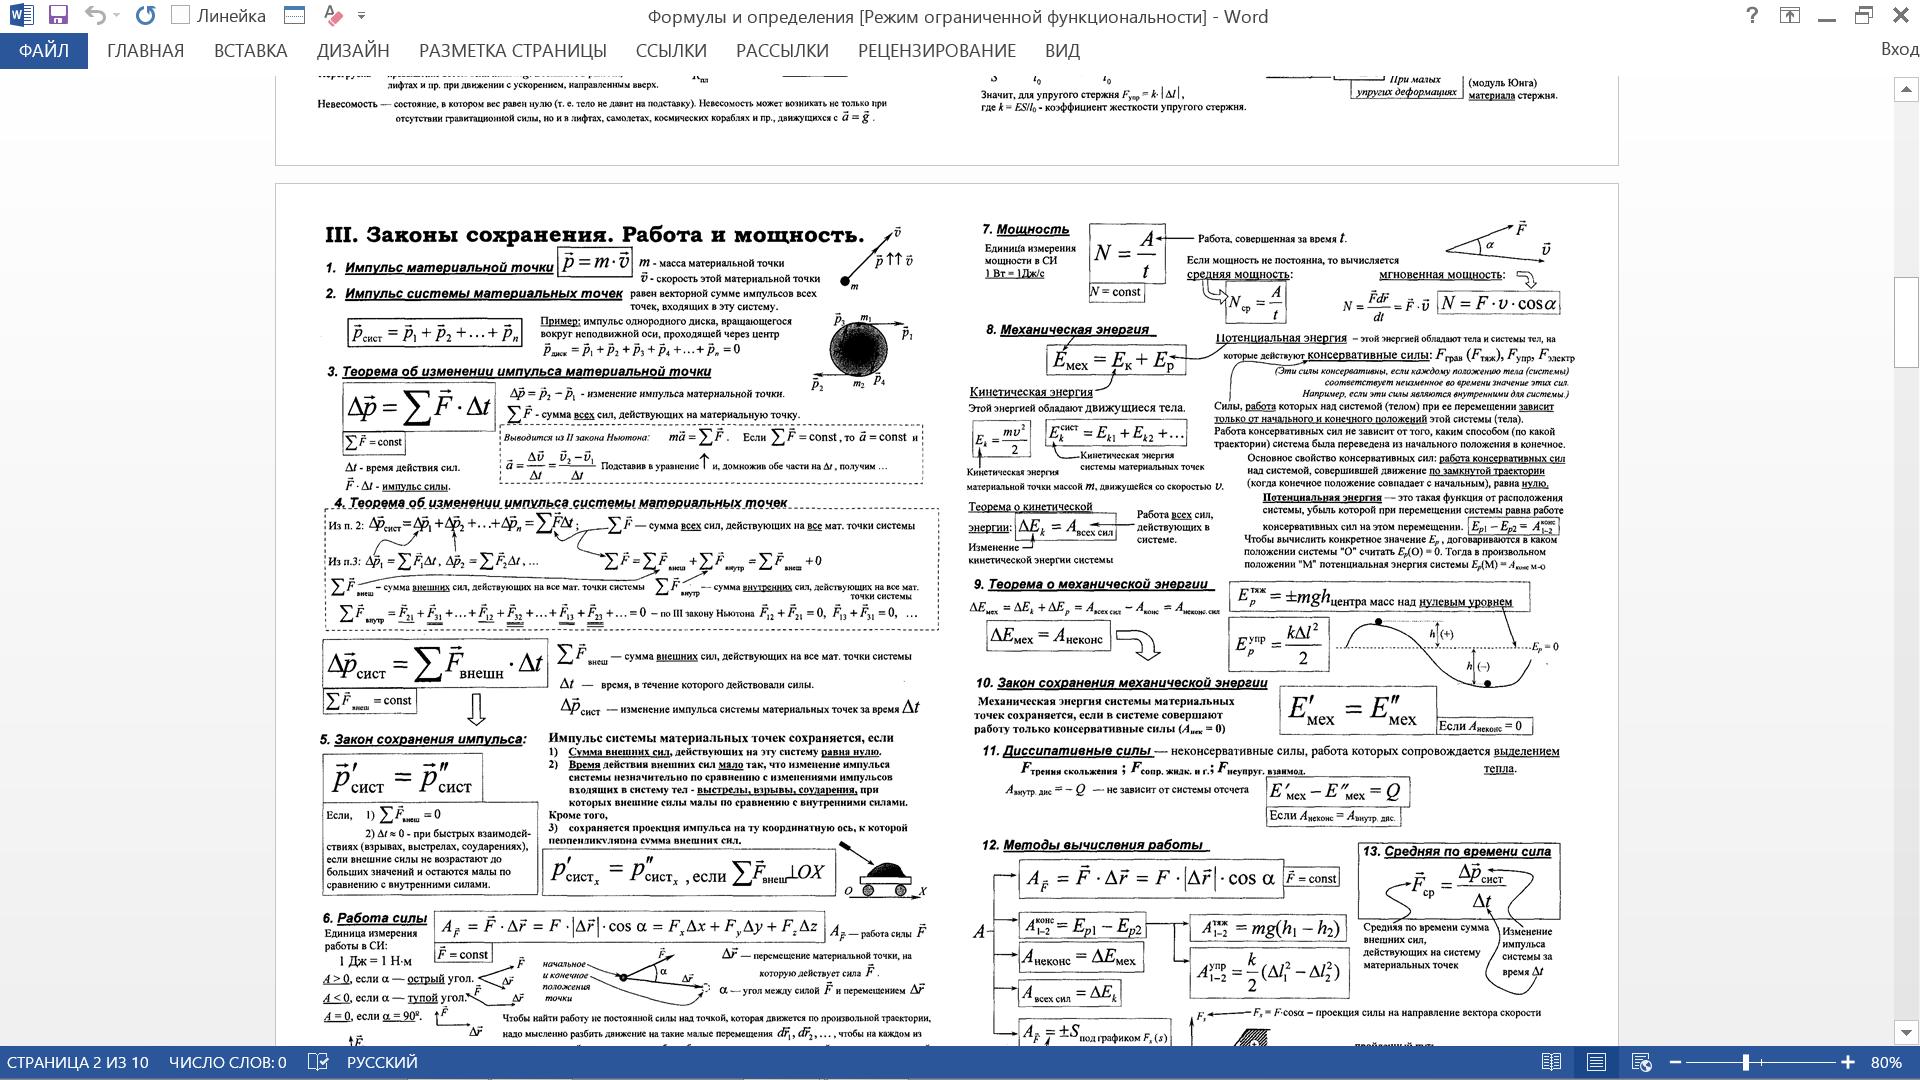 шпаргалки физика формулы 9 класс